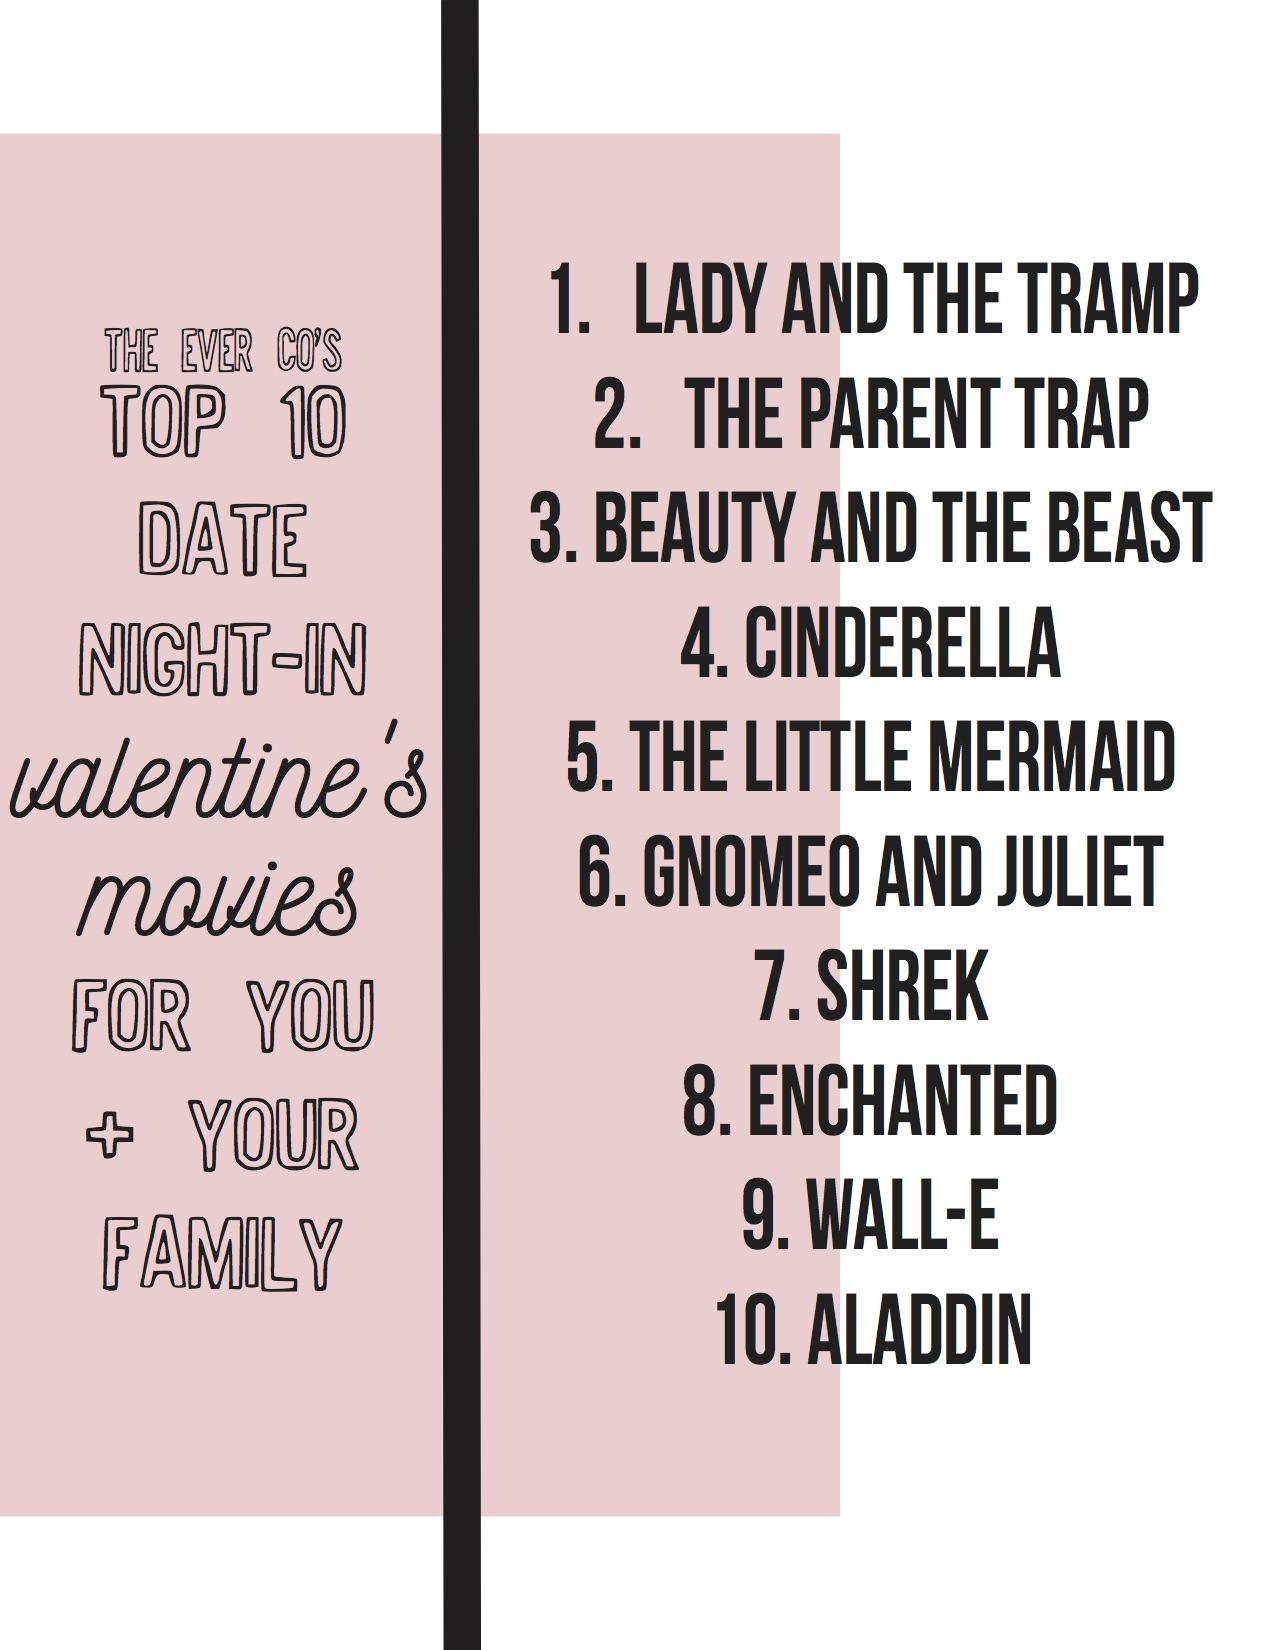 valentines movies family copy.jpg